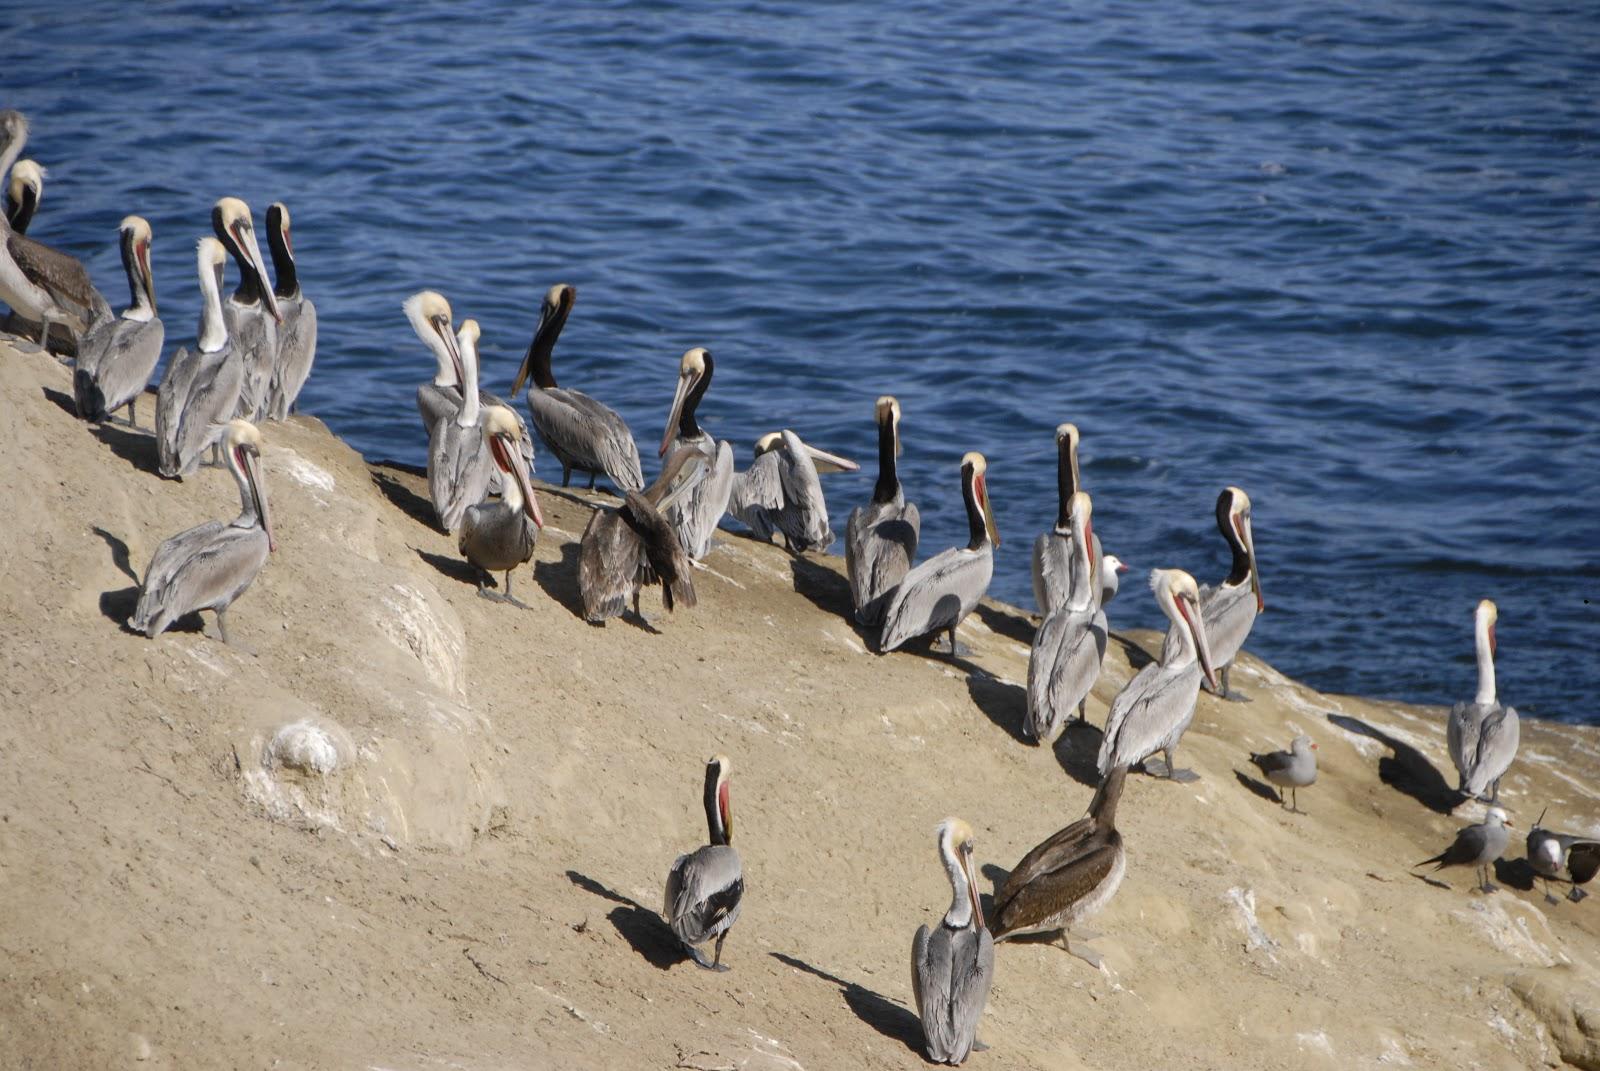 Gathering of birds at La Jolla shores